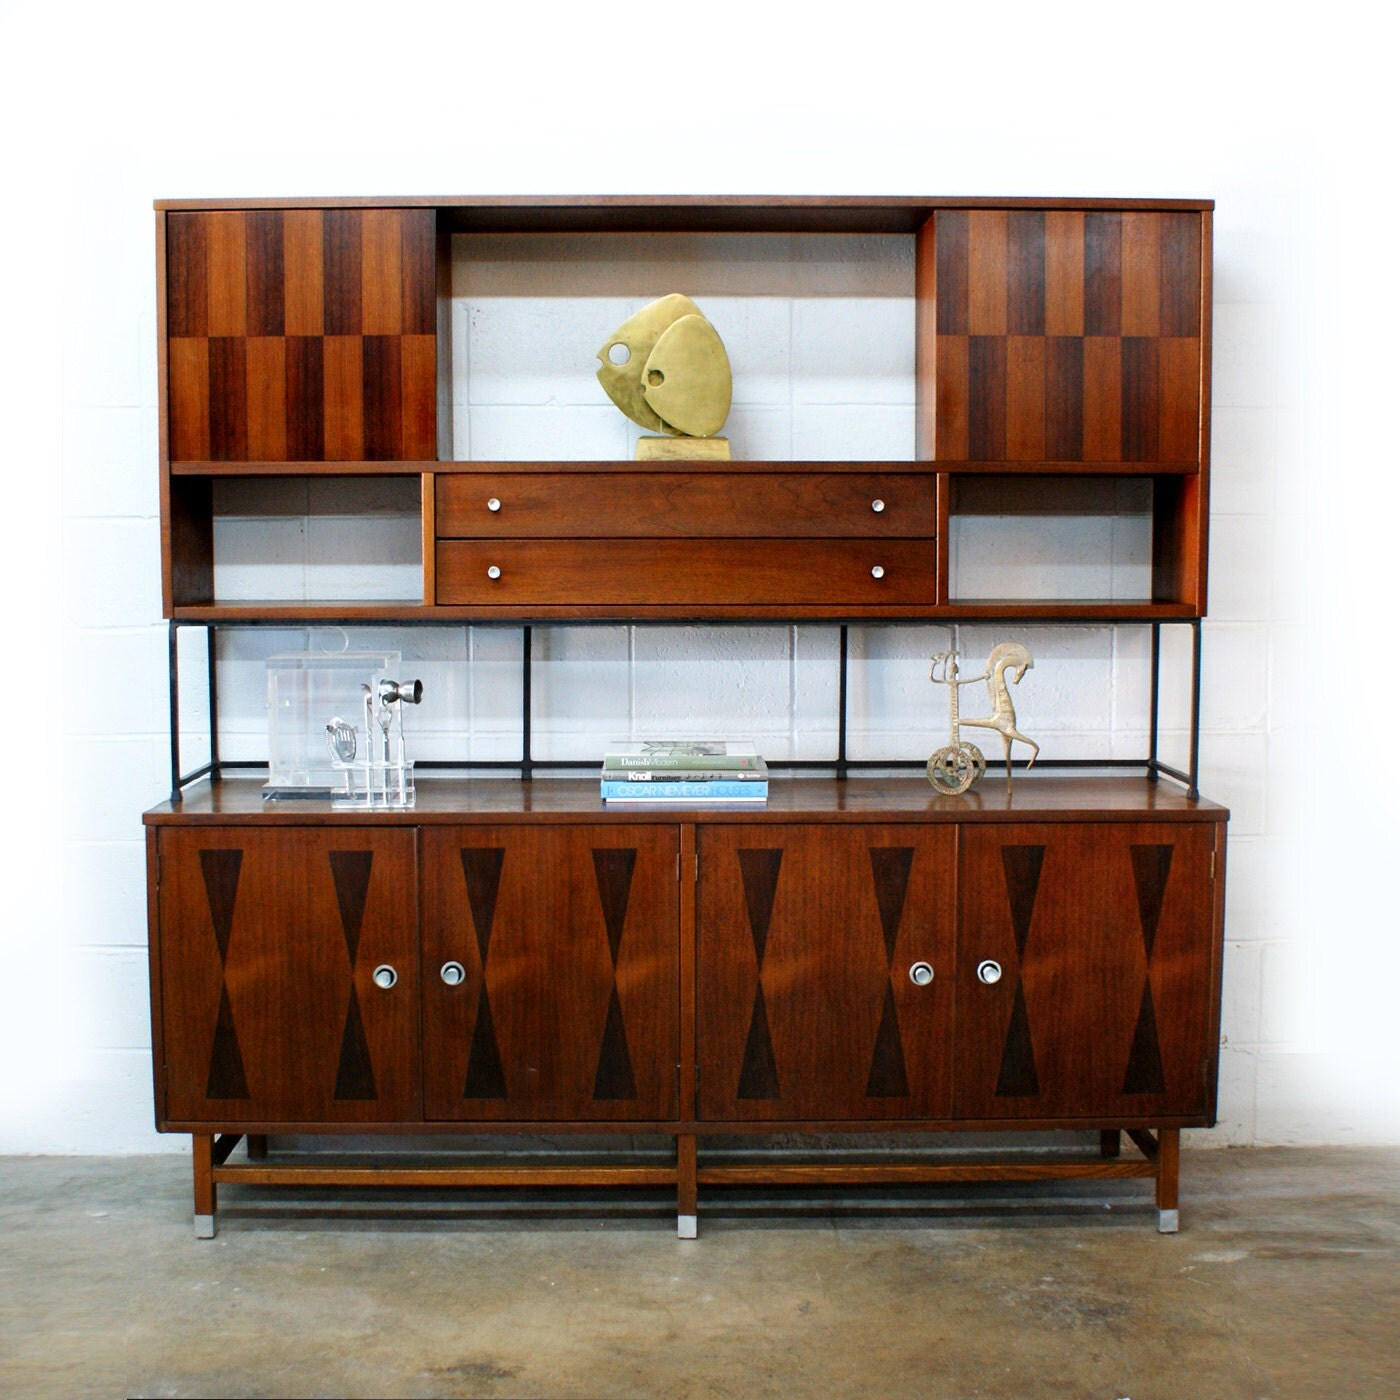 Credenza Mid Century Modern: Mid Century Modern Rosewood Sideboard Credenza